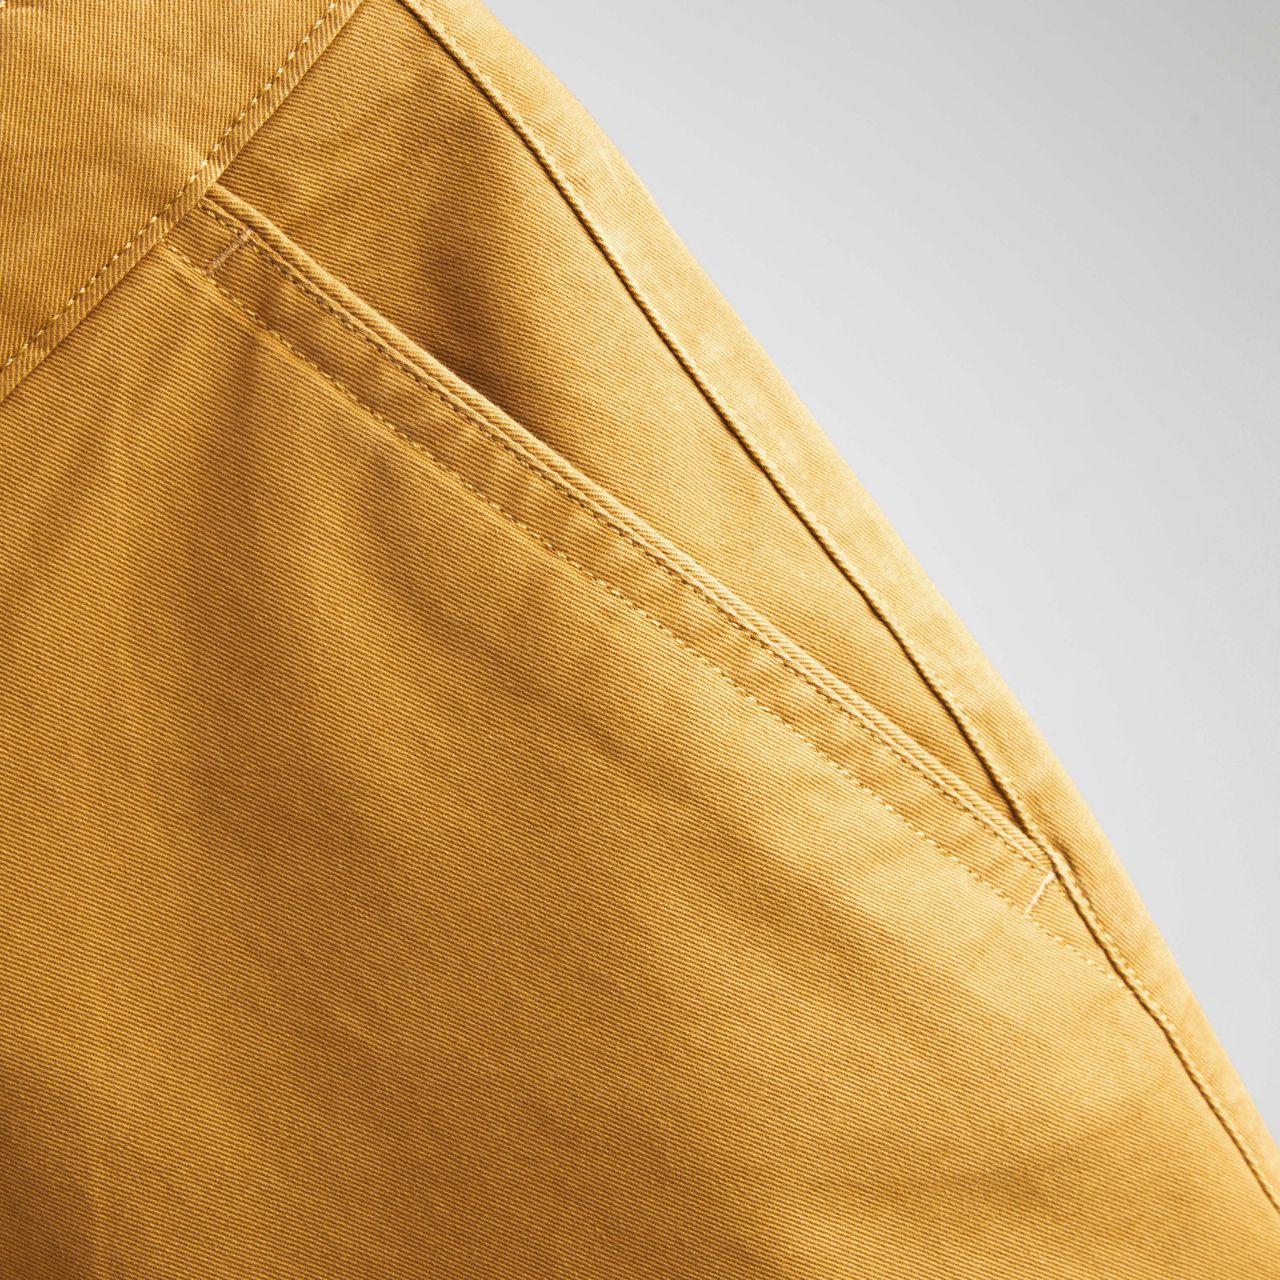 SP348 - Quần Short Kaki Premium Cotton